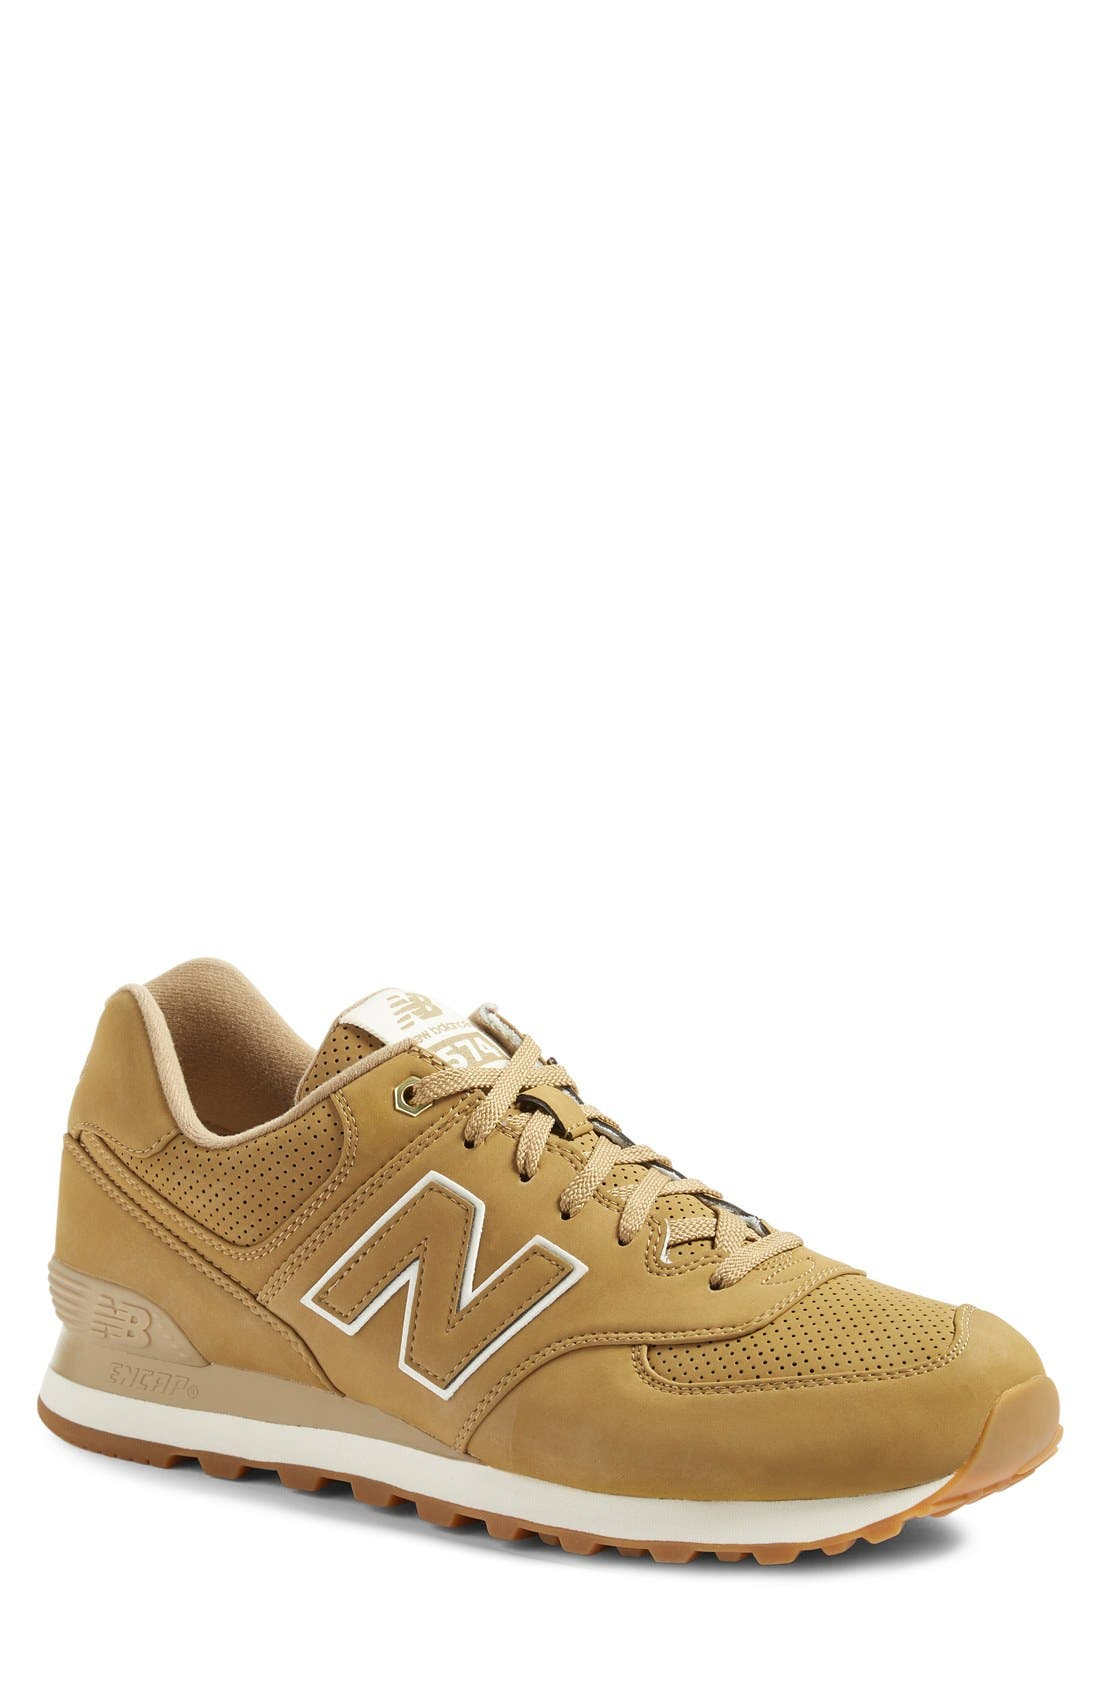 NEW BALANCE 574 Outdoor Sneaker